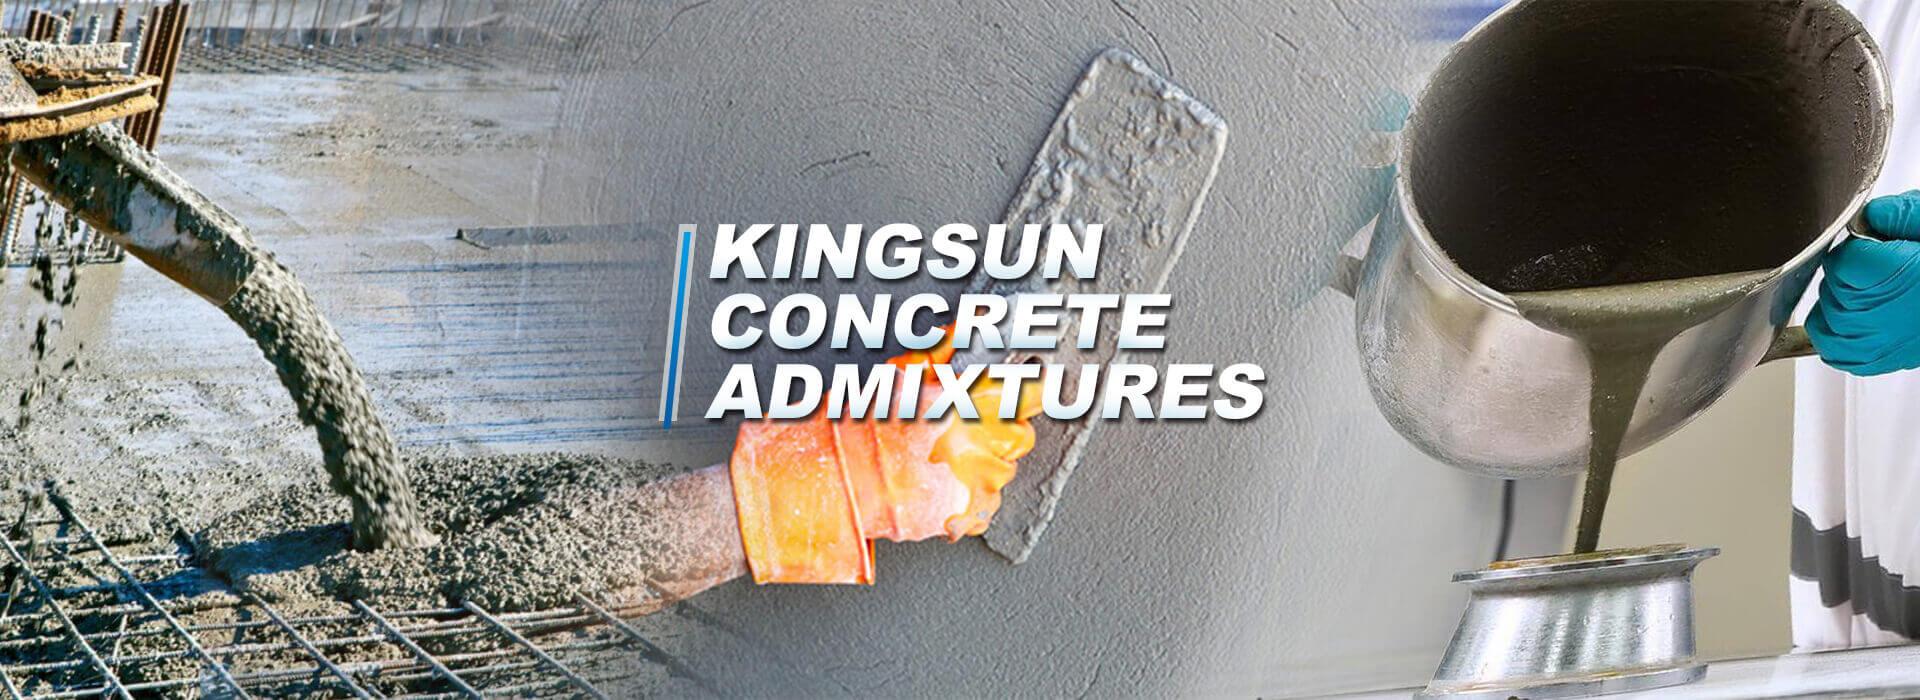 Concrete Admixtures Manufacturer